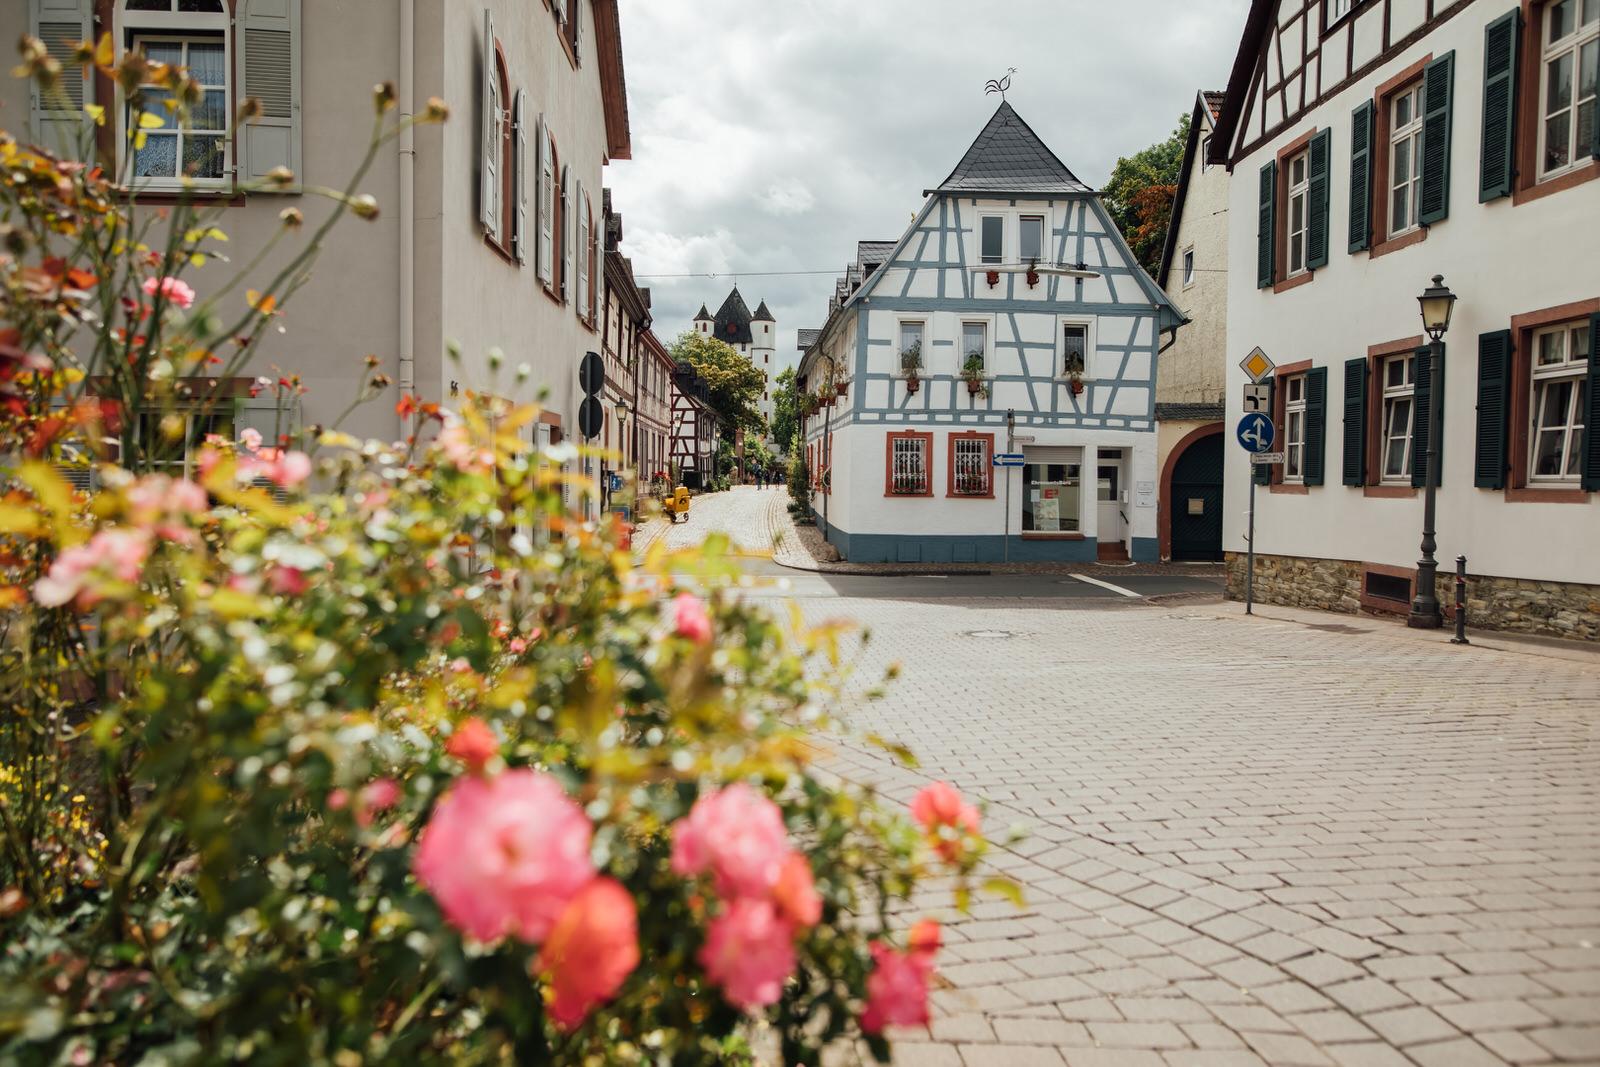 Paul_Traeger_Hochzeitsfotograf_Thueringen_Erfurt_Jena_Weimar_100221227.JPG